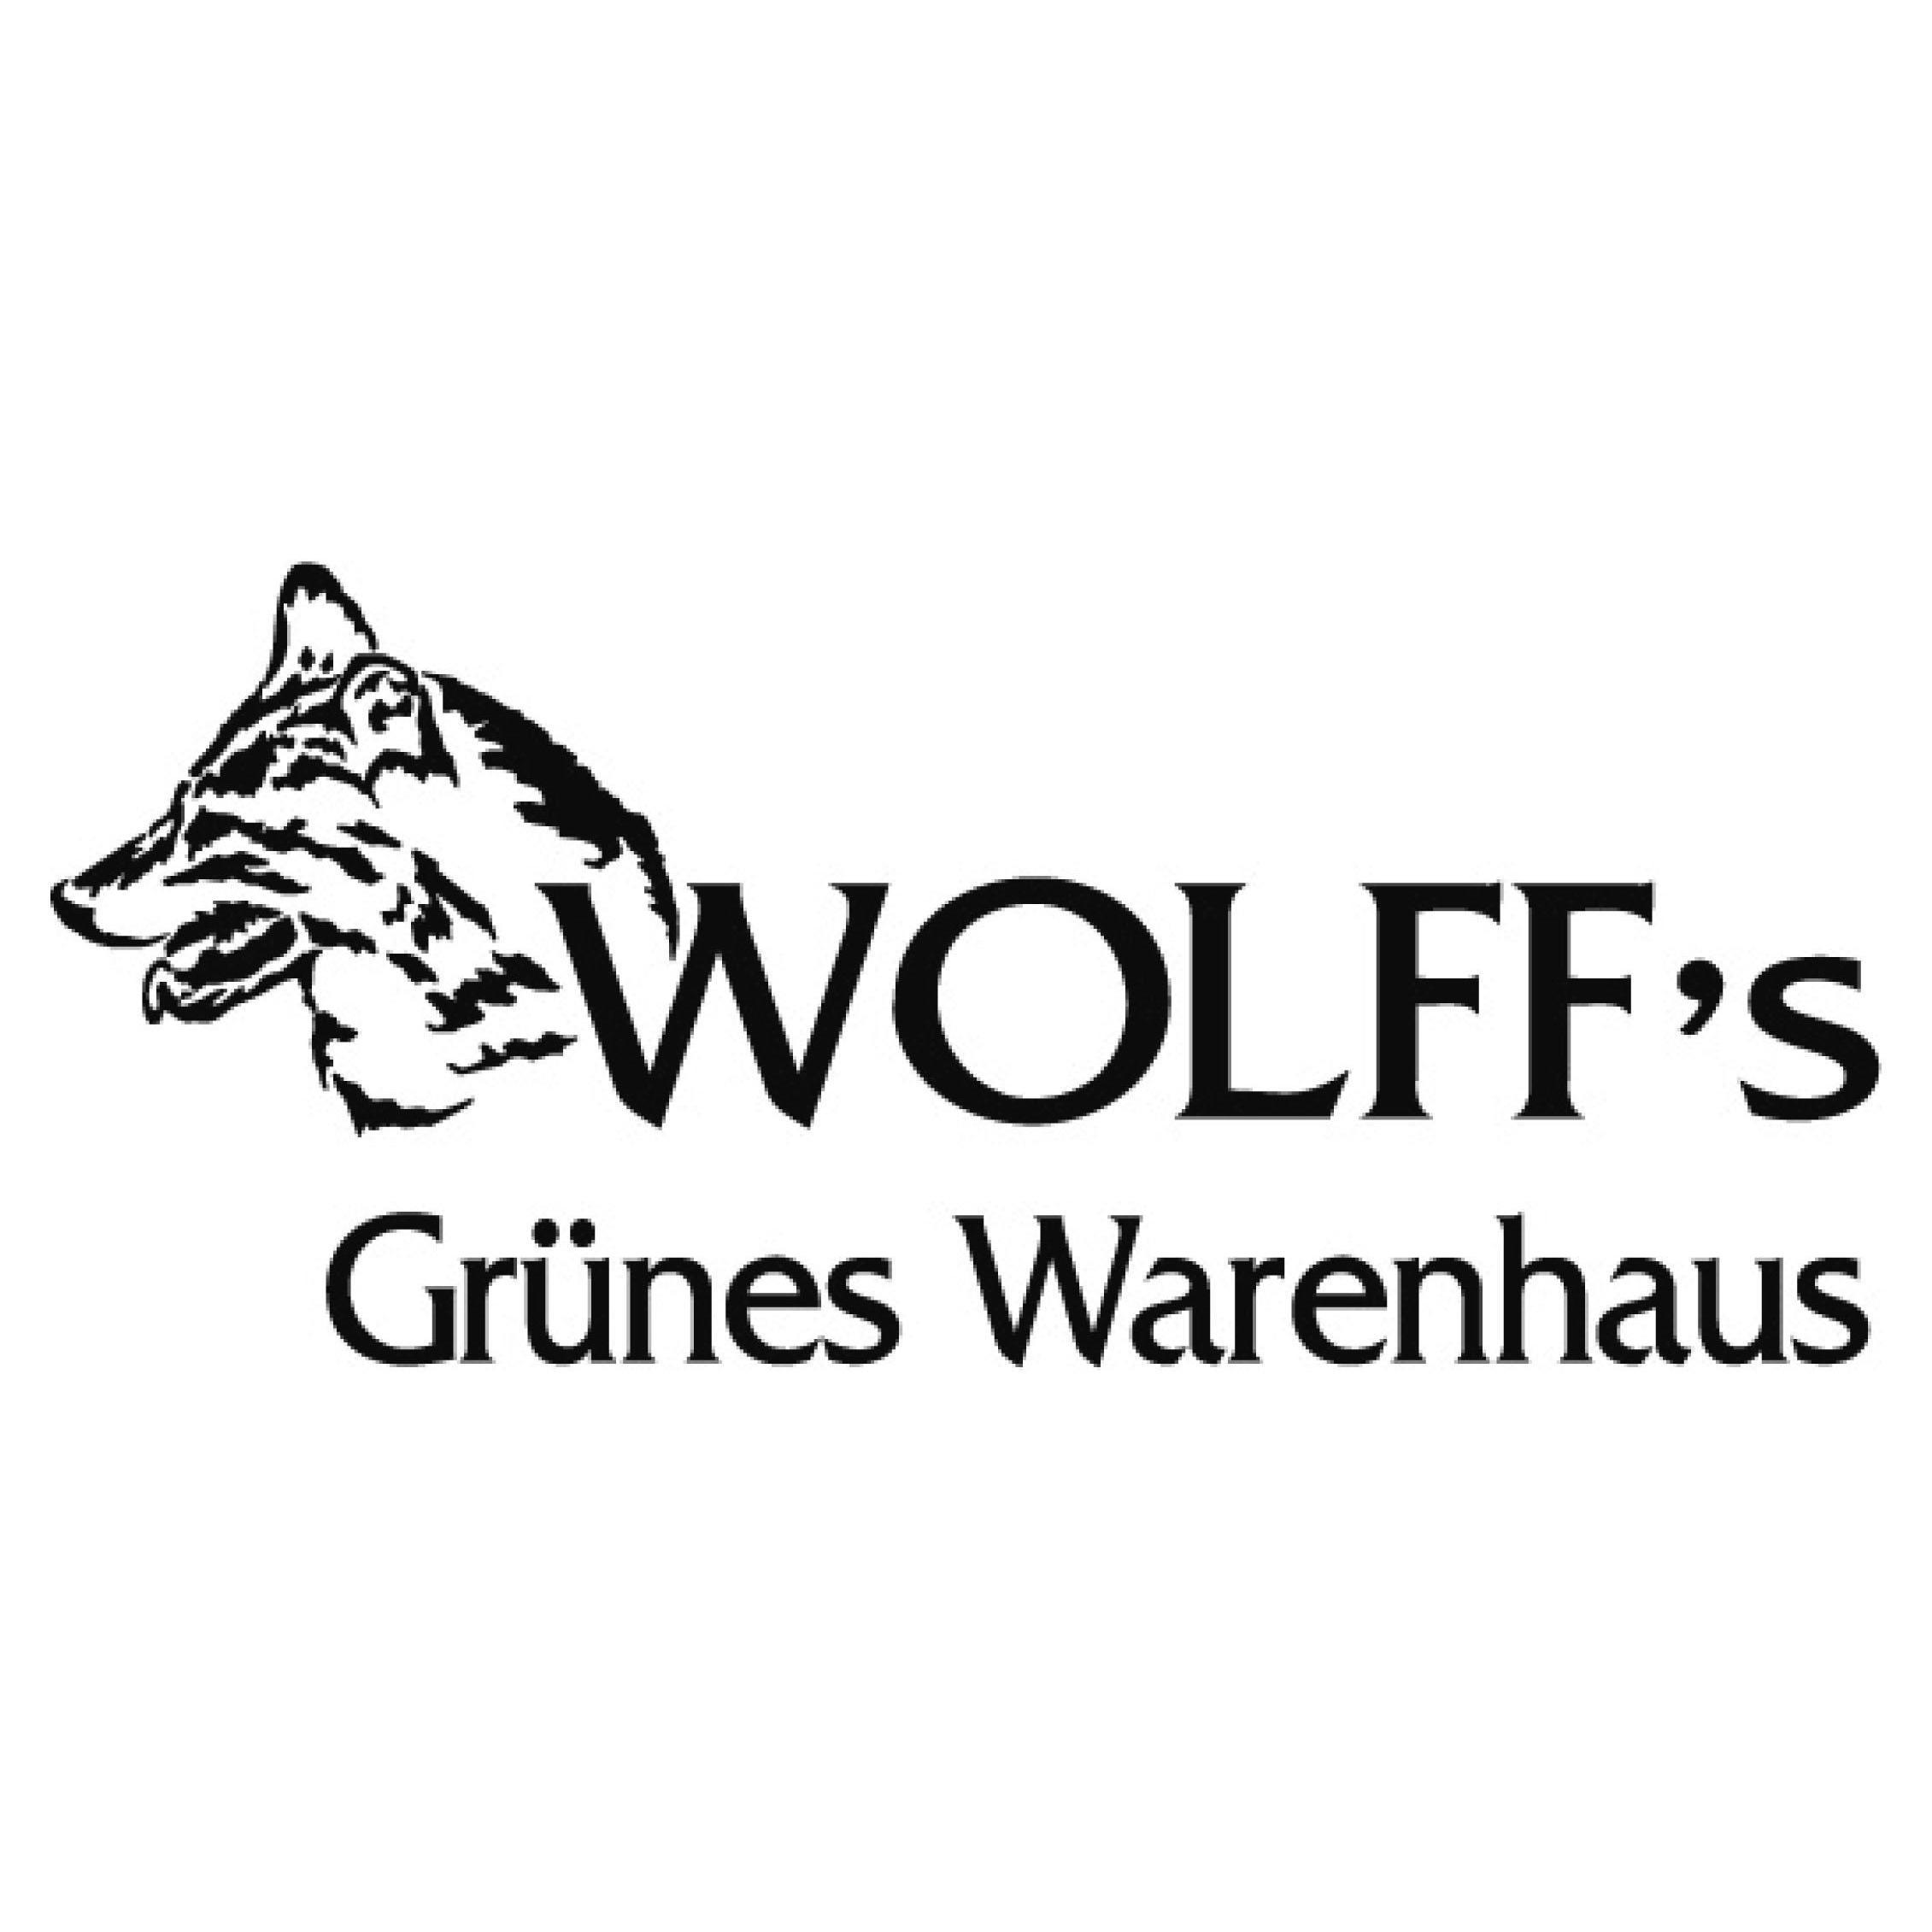 Foto de Wolff's Grünes Warenhaus